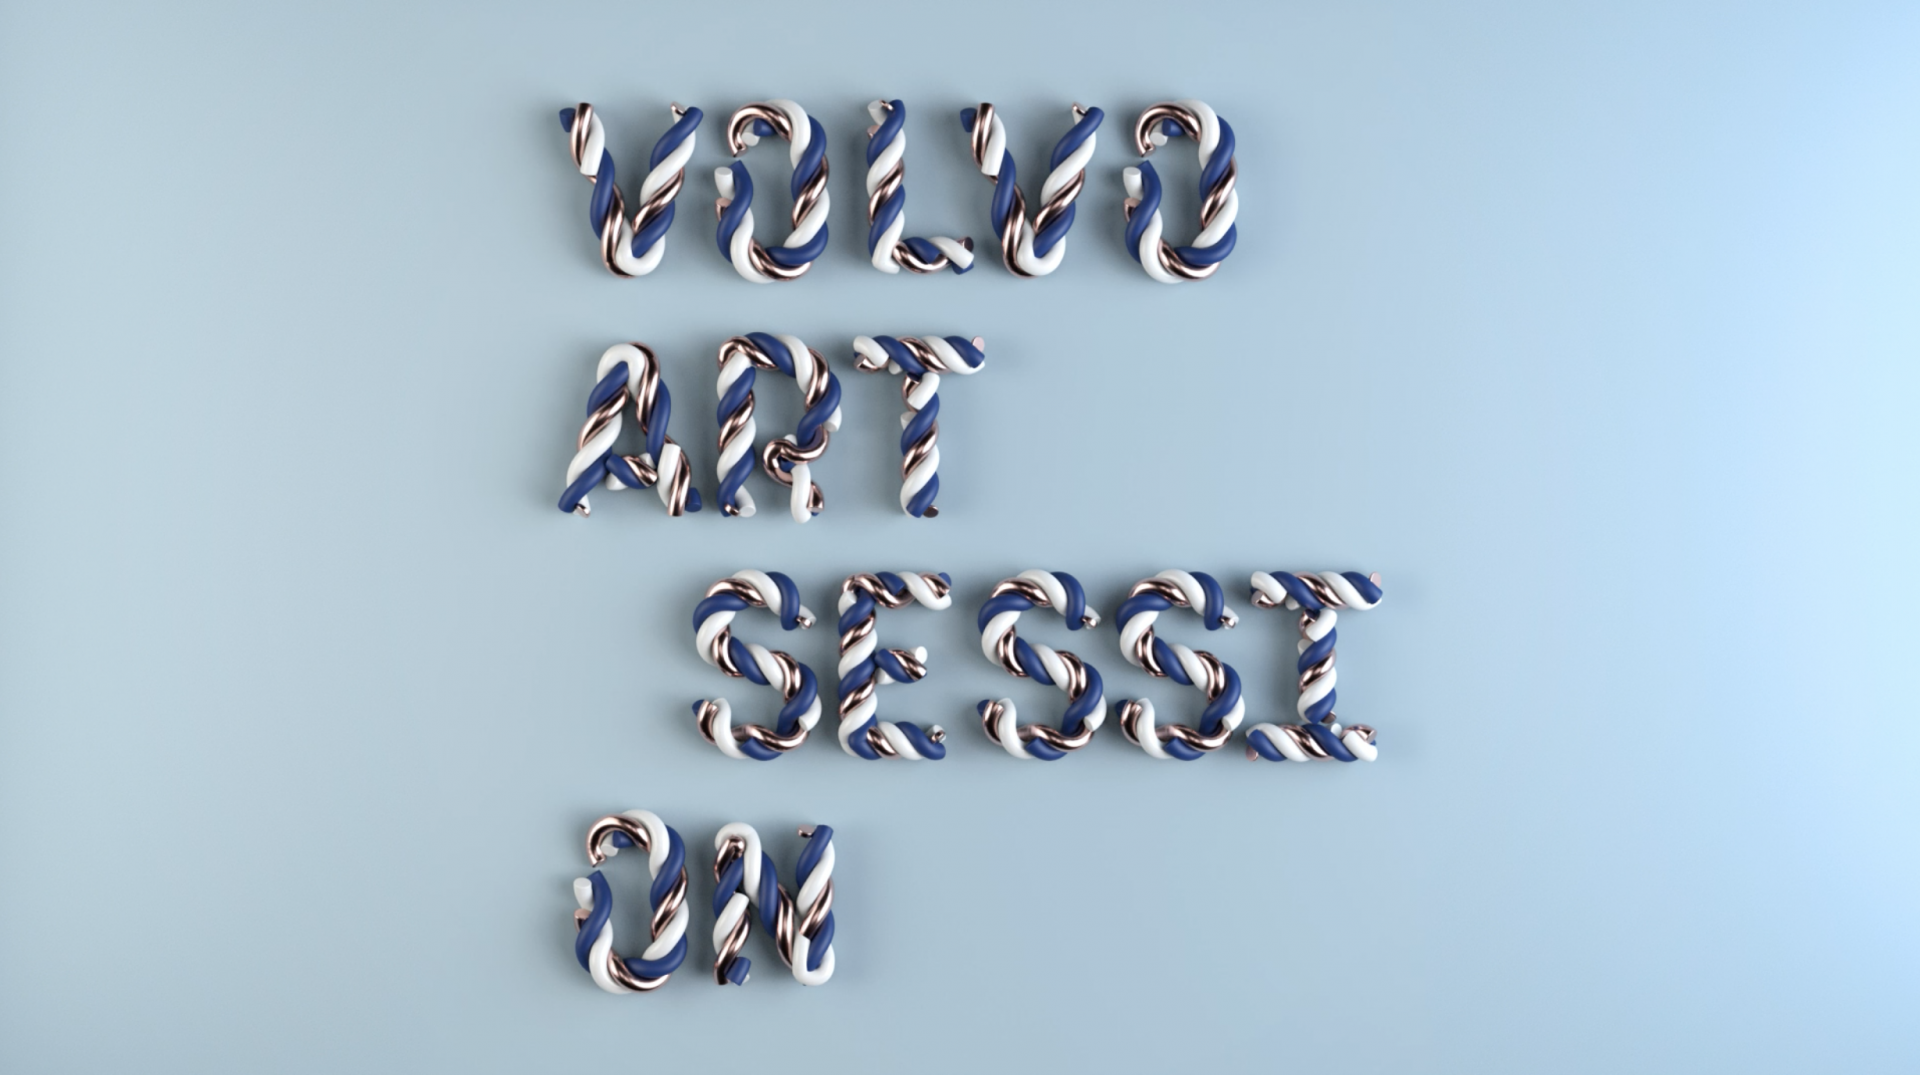 Die Volvo Art Session 2018 zeigt internationale, digitale Kunst